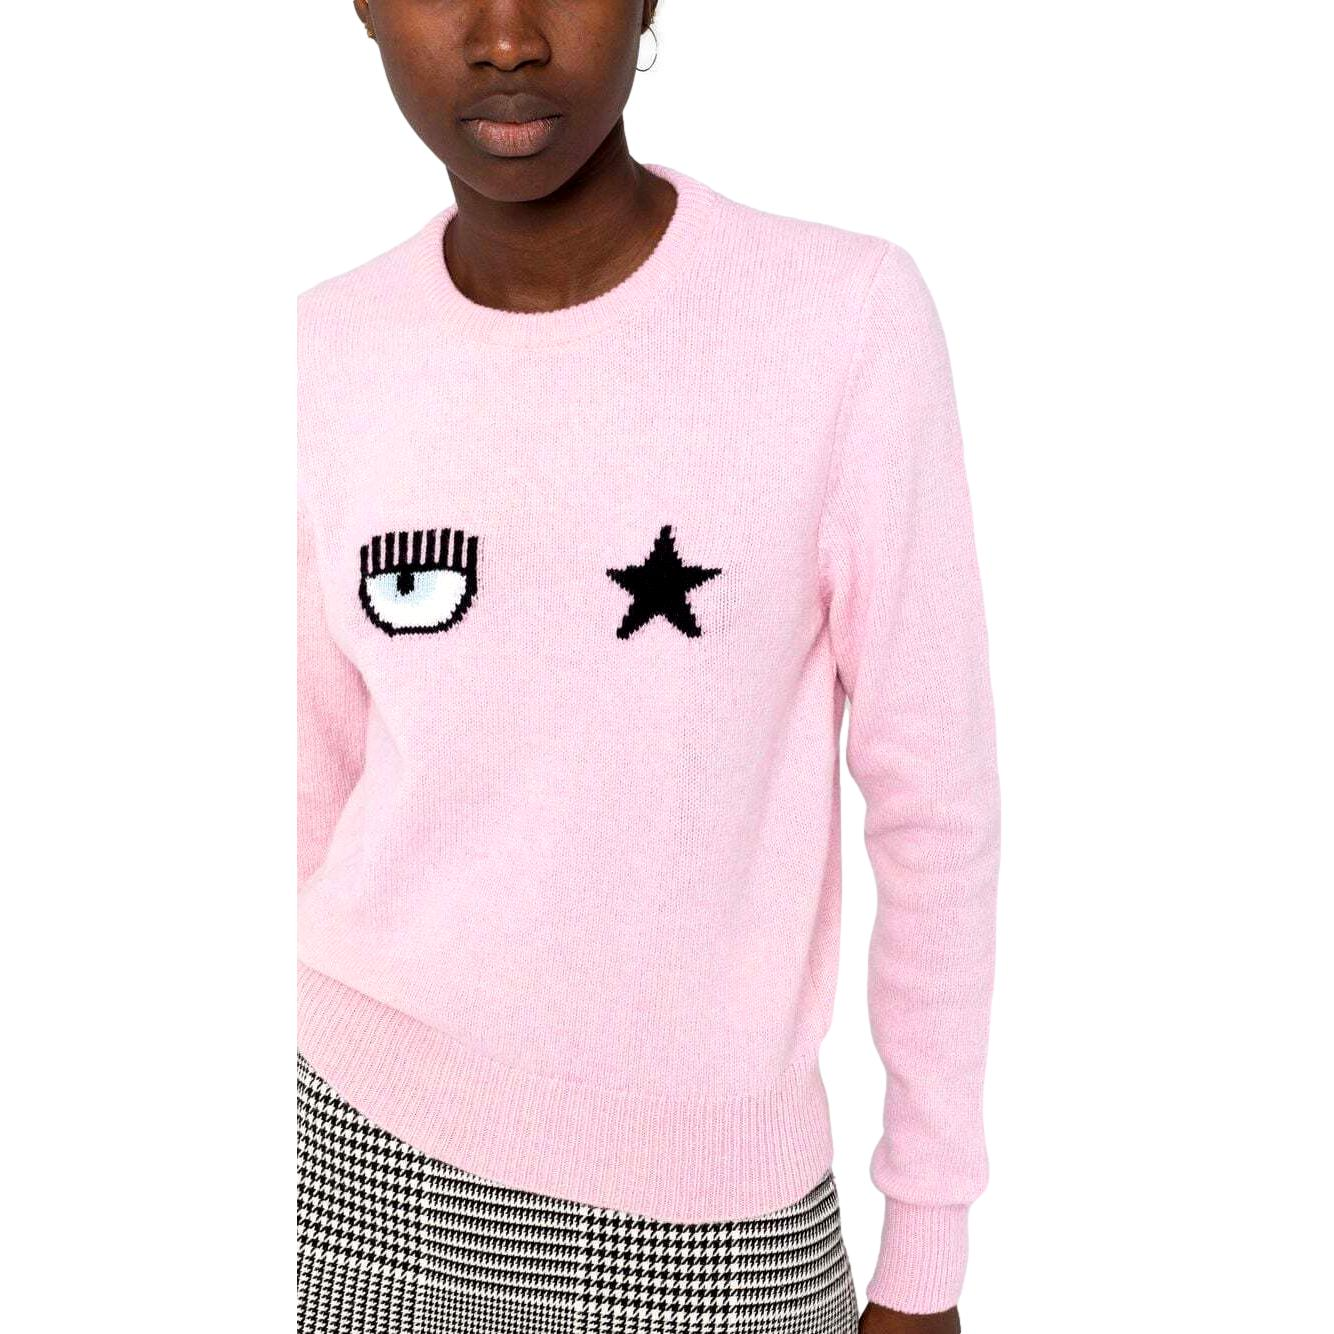 Eyestar crew neck sweater  CHIARA FERRAGNI      71CBFM01 CMM00414